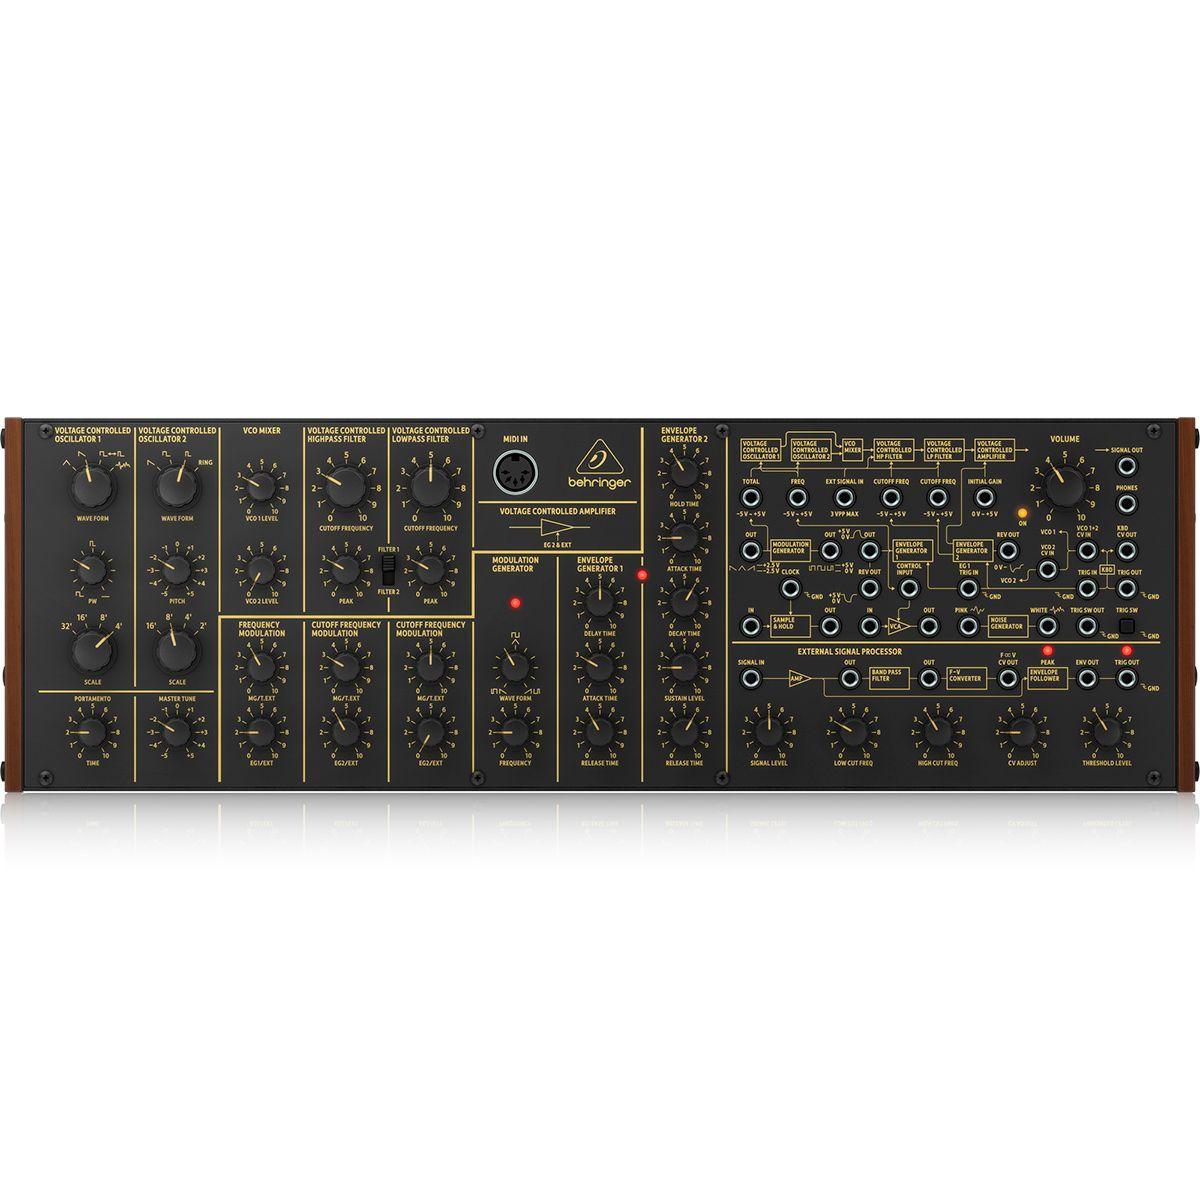 Sintetizador Analógico semi-modular Behringer K-2